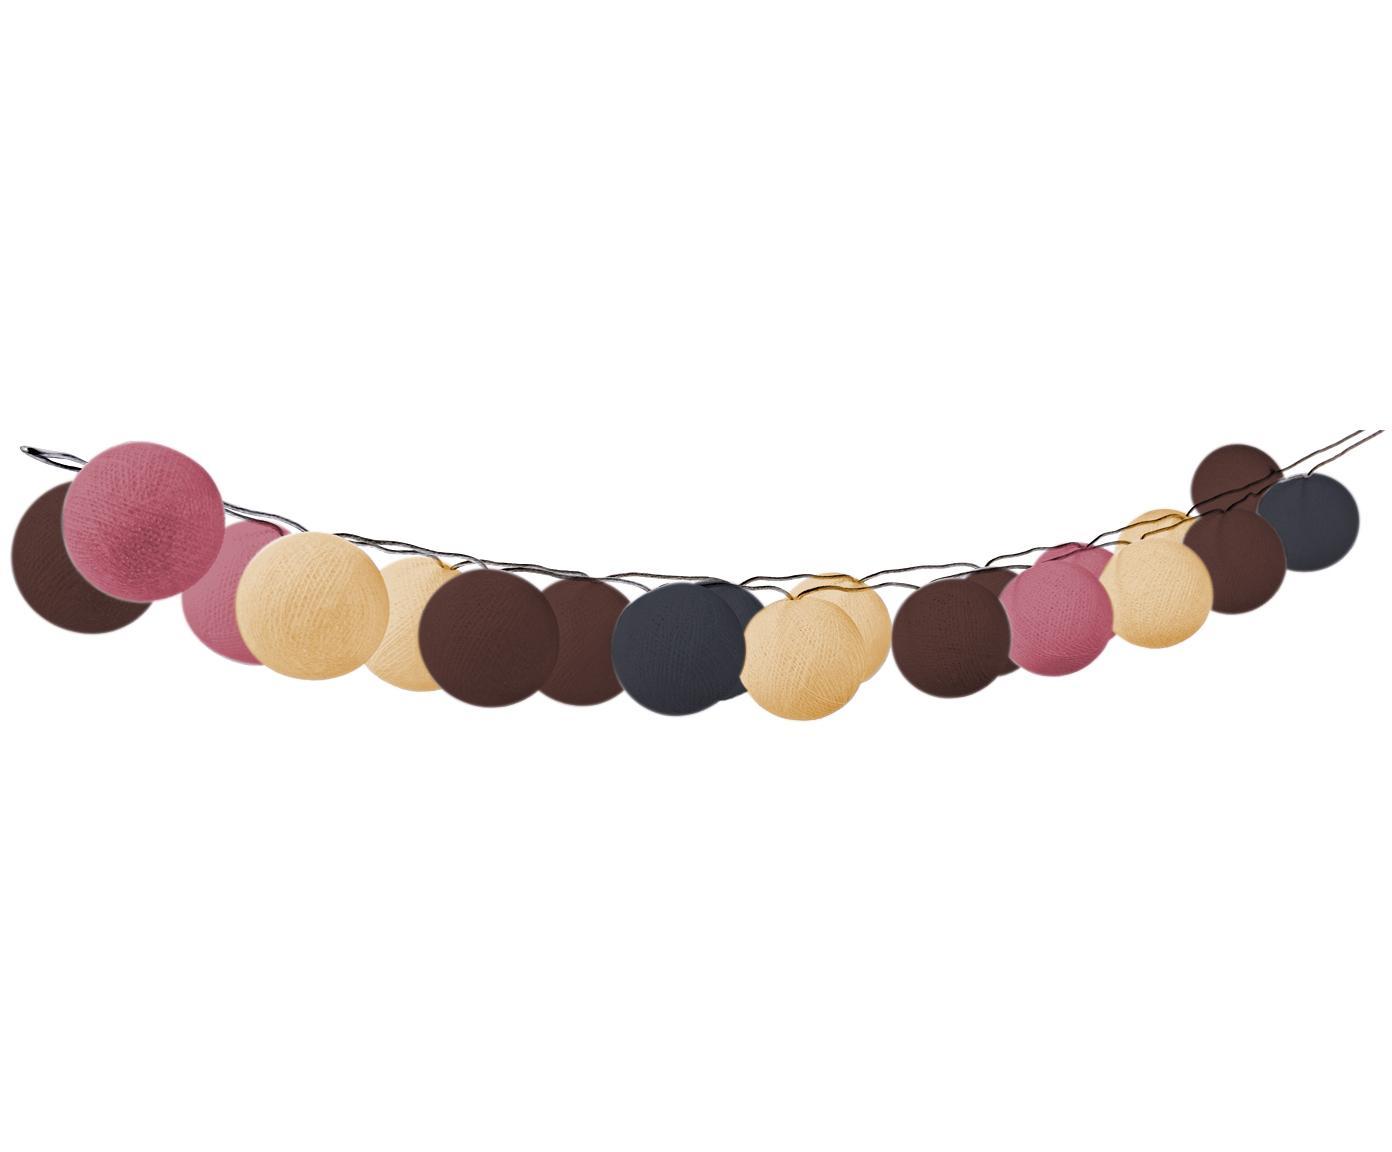 Guirnalda de luces LED Bellin, 320cm, Linternas: algodón, Cable: plástico, Marrón, beige, negro, rosa, L 320 cm